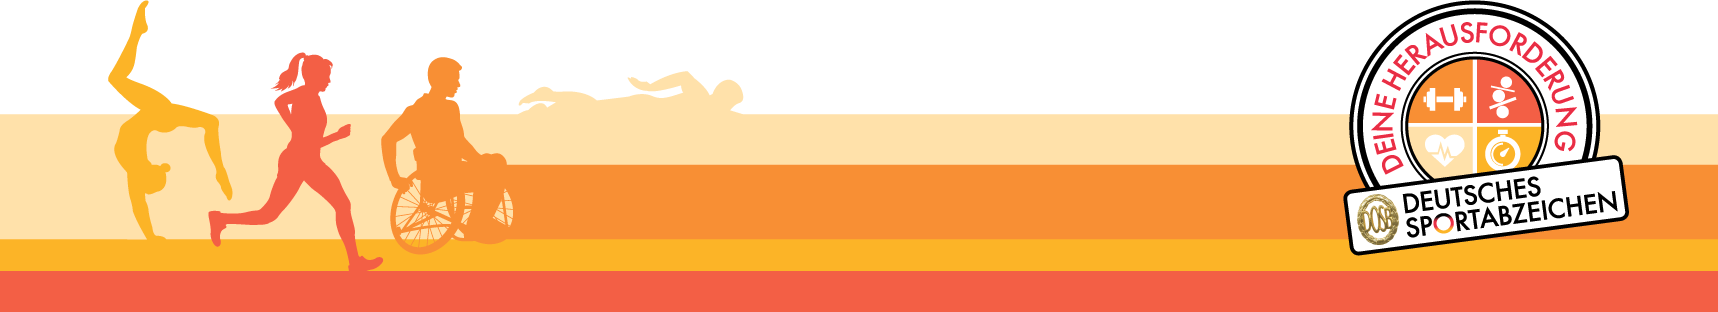 Sportabzeichen KeyVisual Stempel Farbe DINA4 Querformat